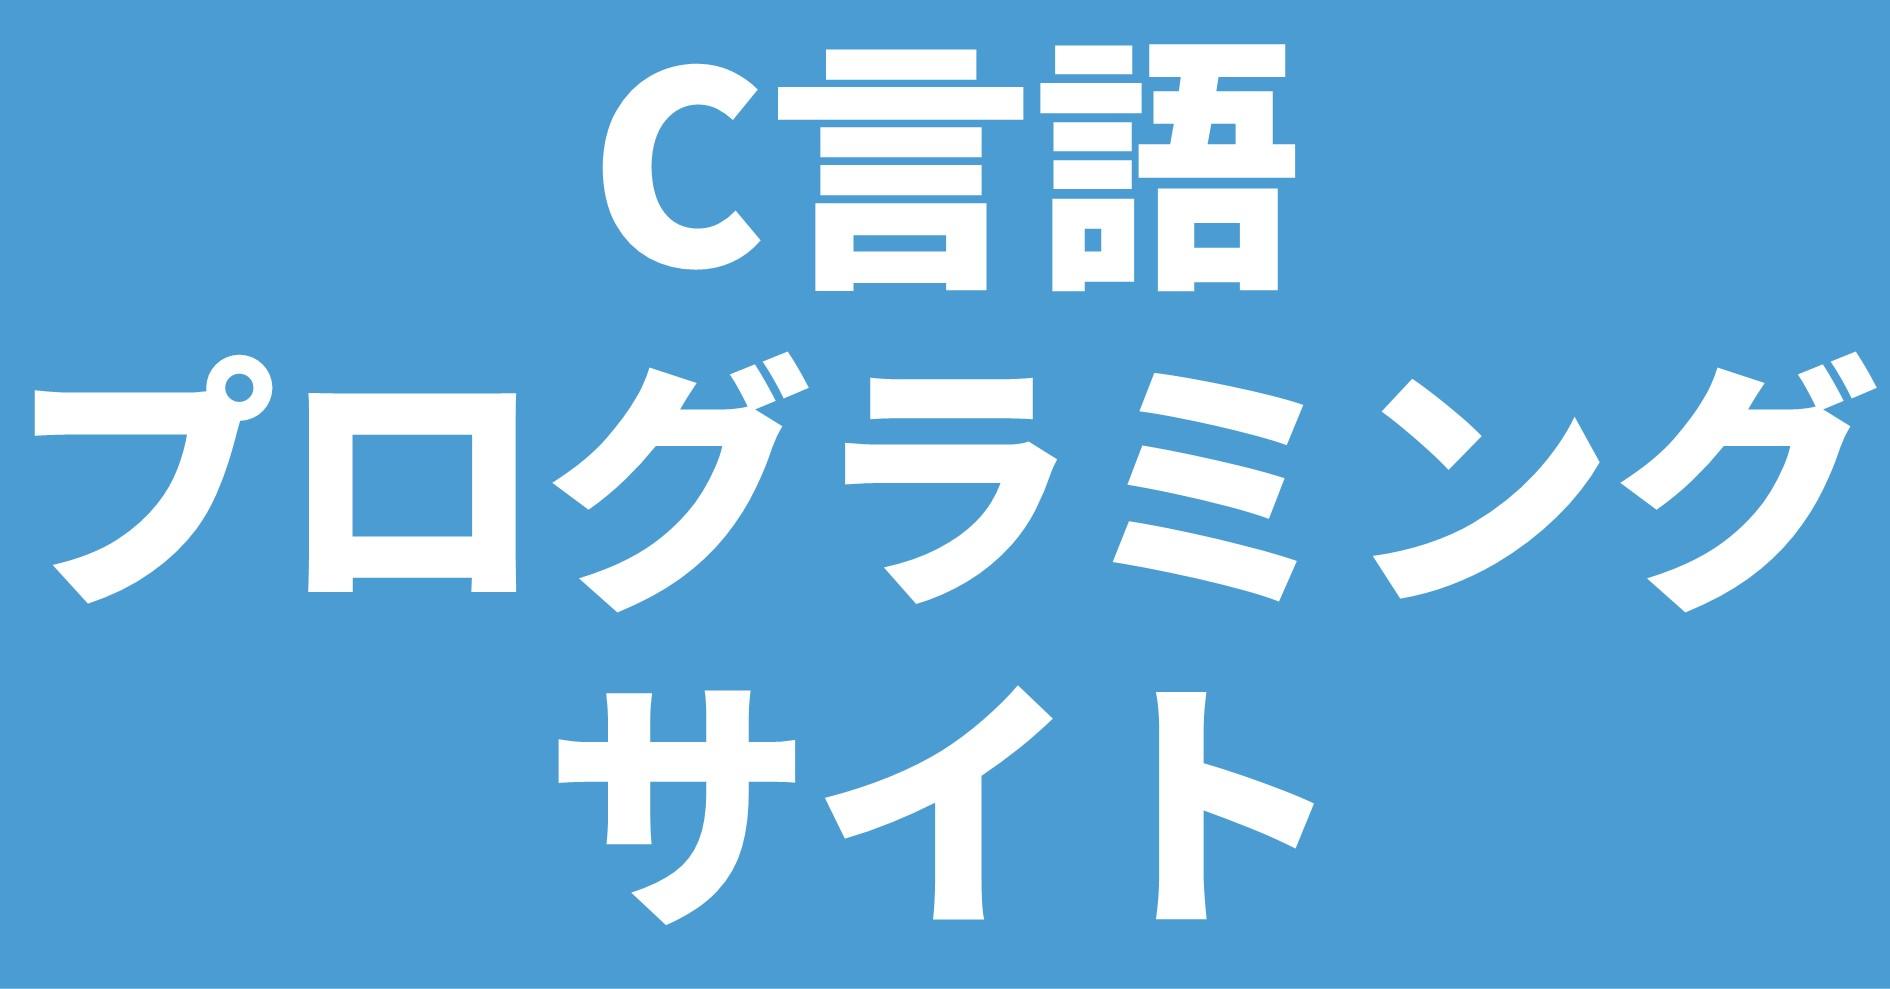 C言語 プログラミング サイト